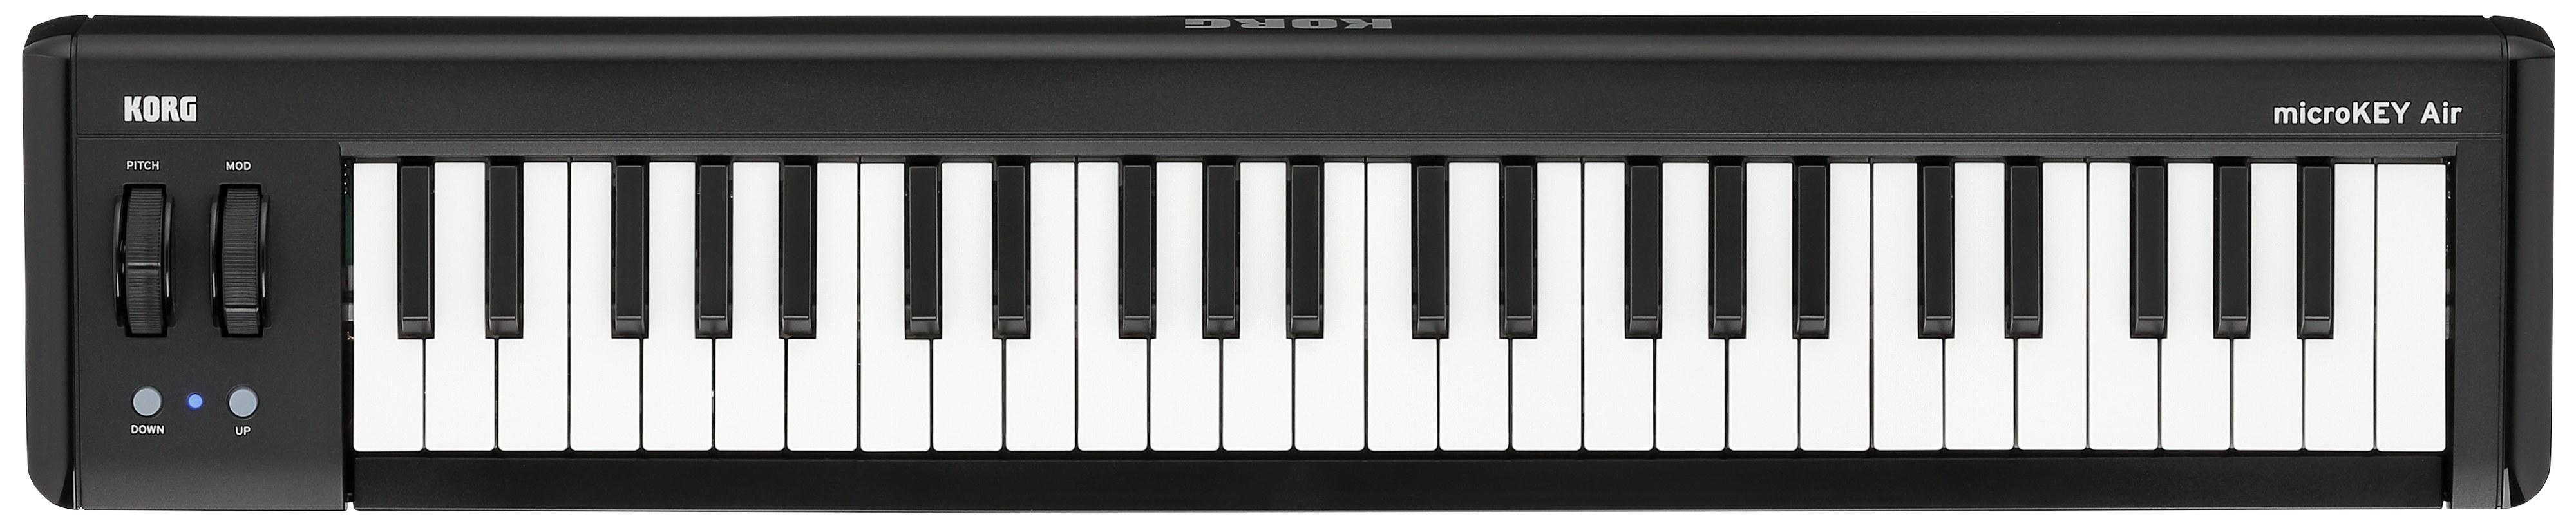 KORG microKEY2 49 Air USB Controller Keyboard